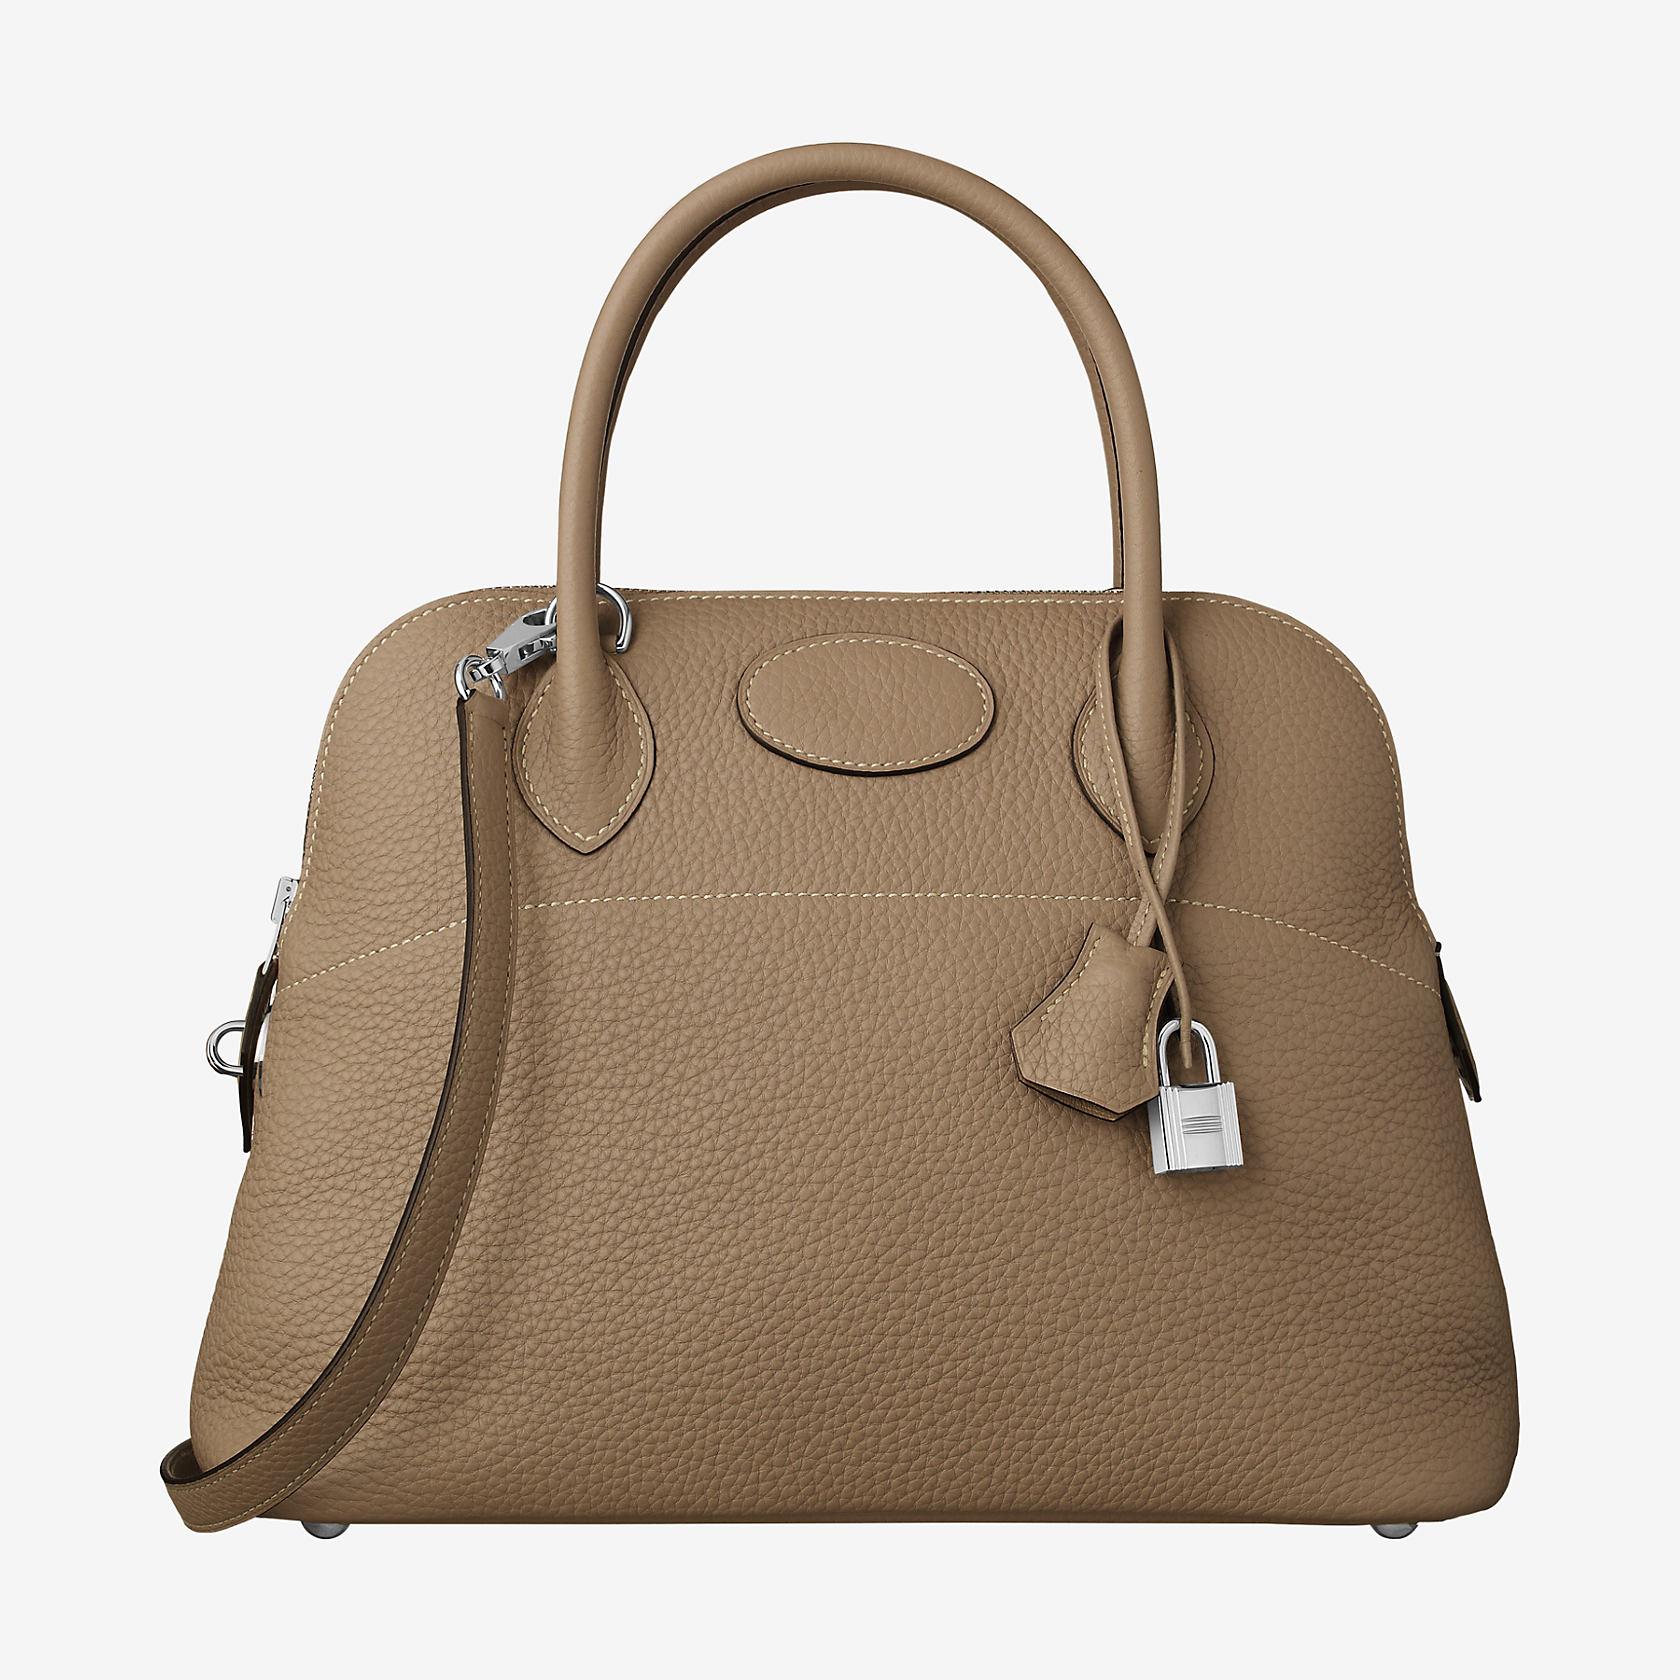 Bolide 31 bag, medium model